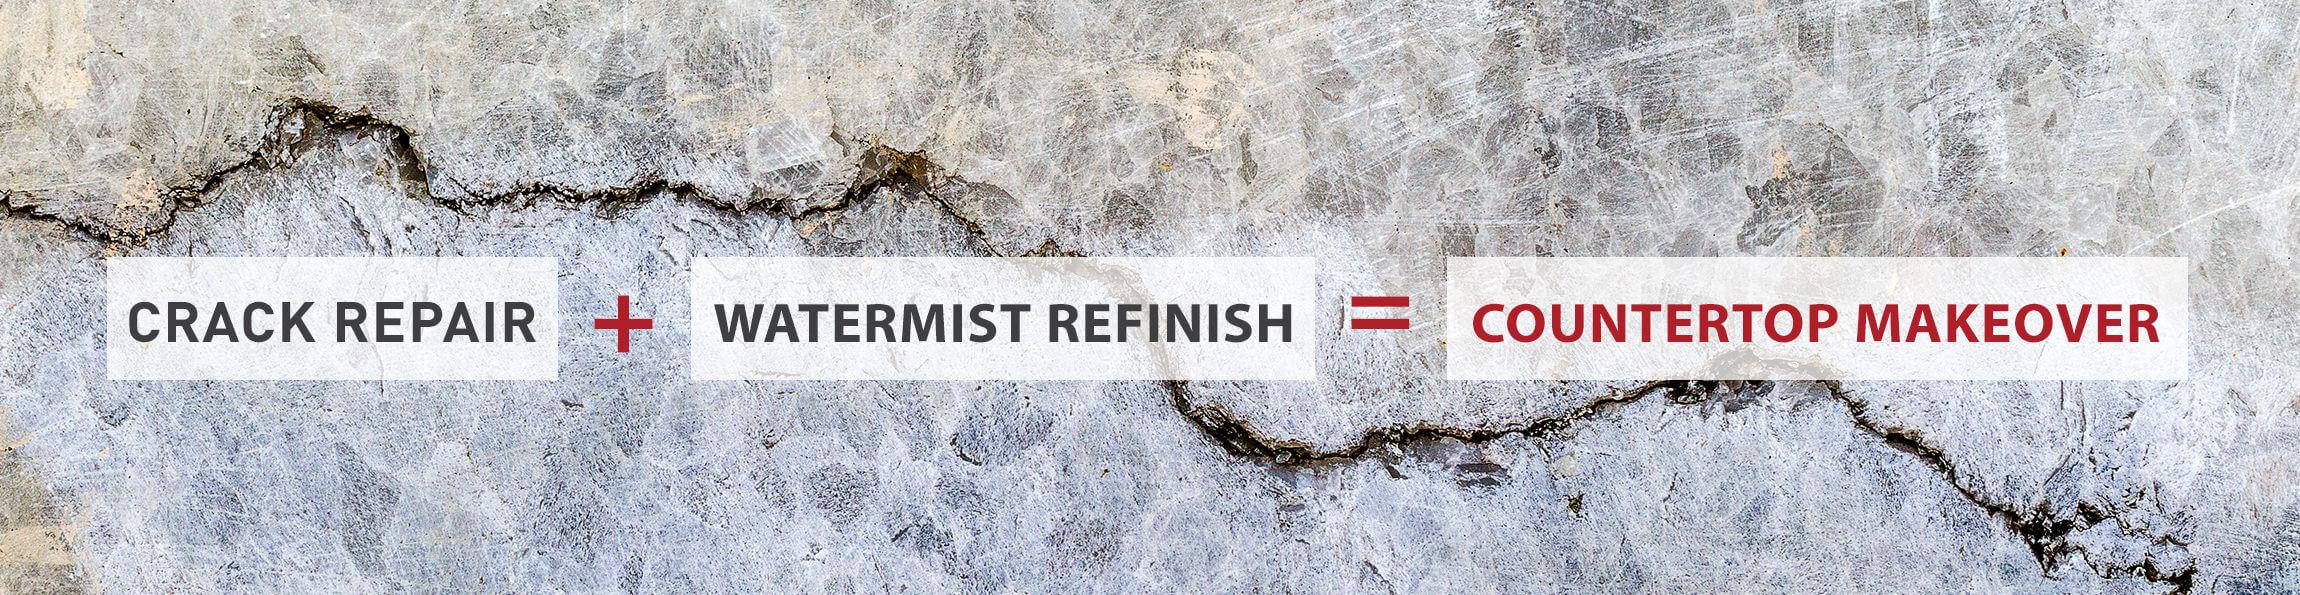 Surface Link Coutnertop Crack Repair Watermist Refinish Coutnertop Makeover